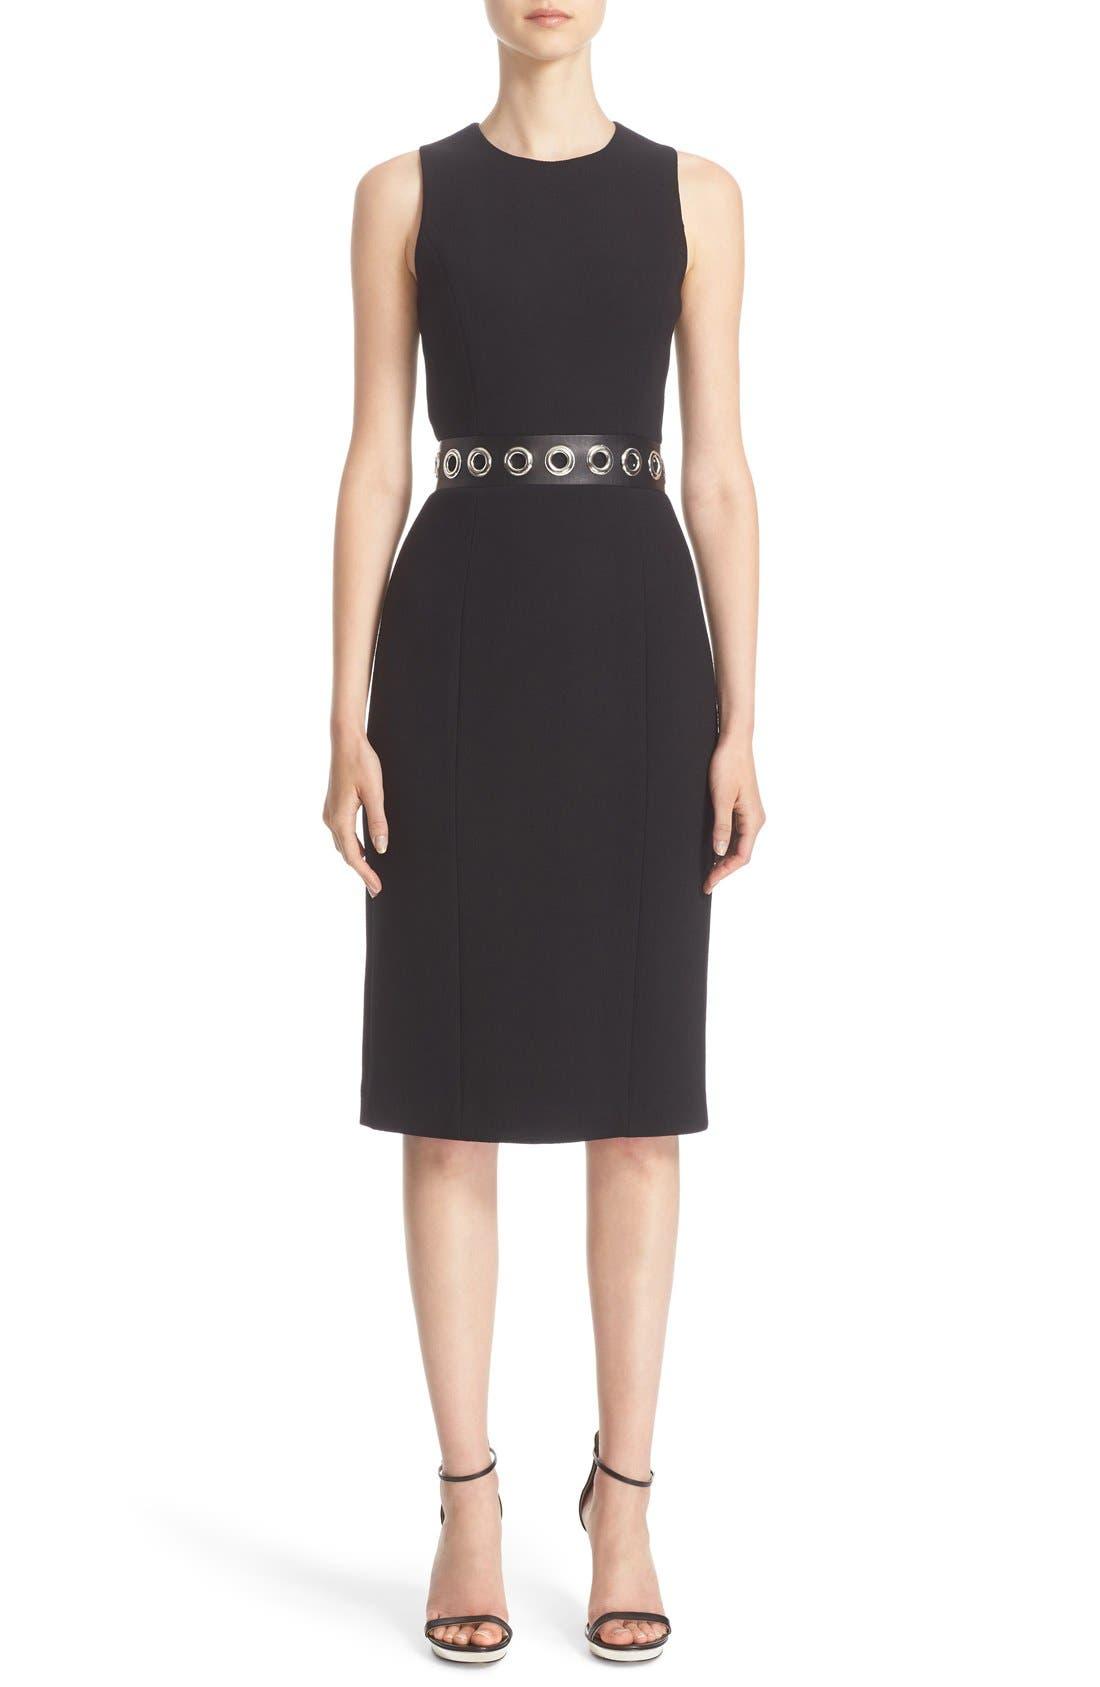 MICHAEL KORS Stretch Wool Dress